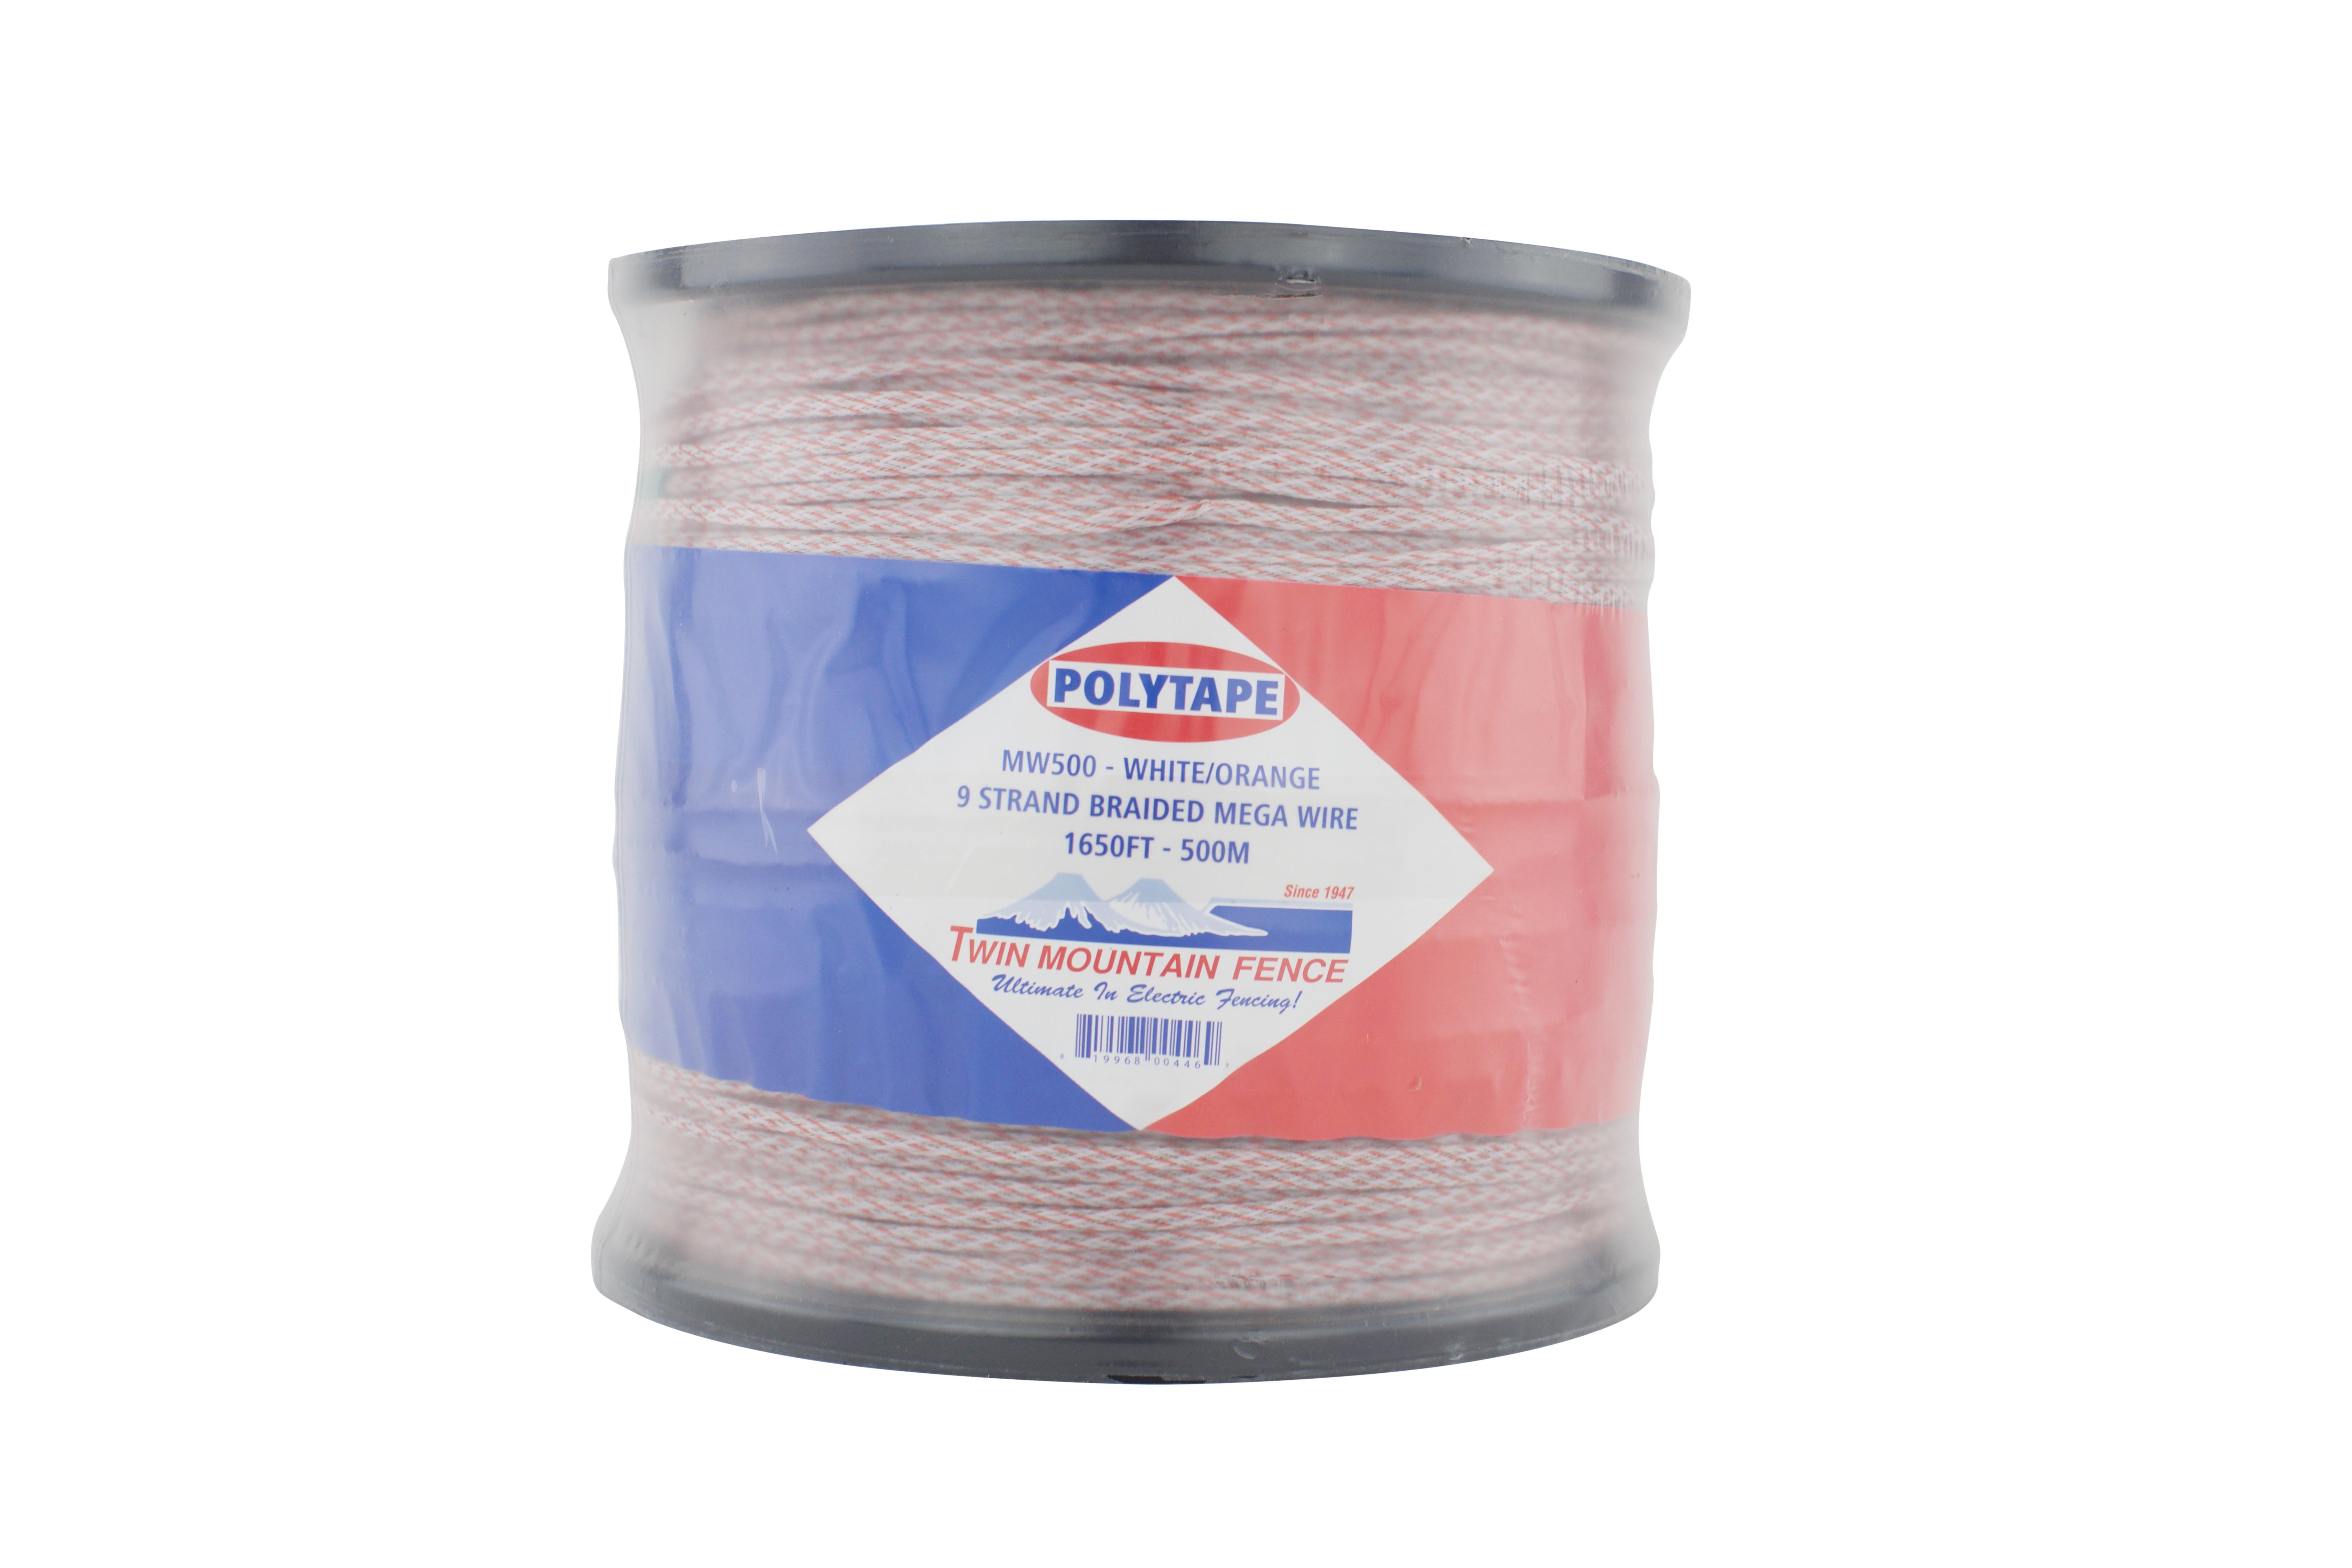 1,650' Braided Mega Wire